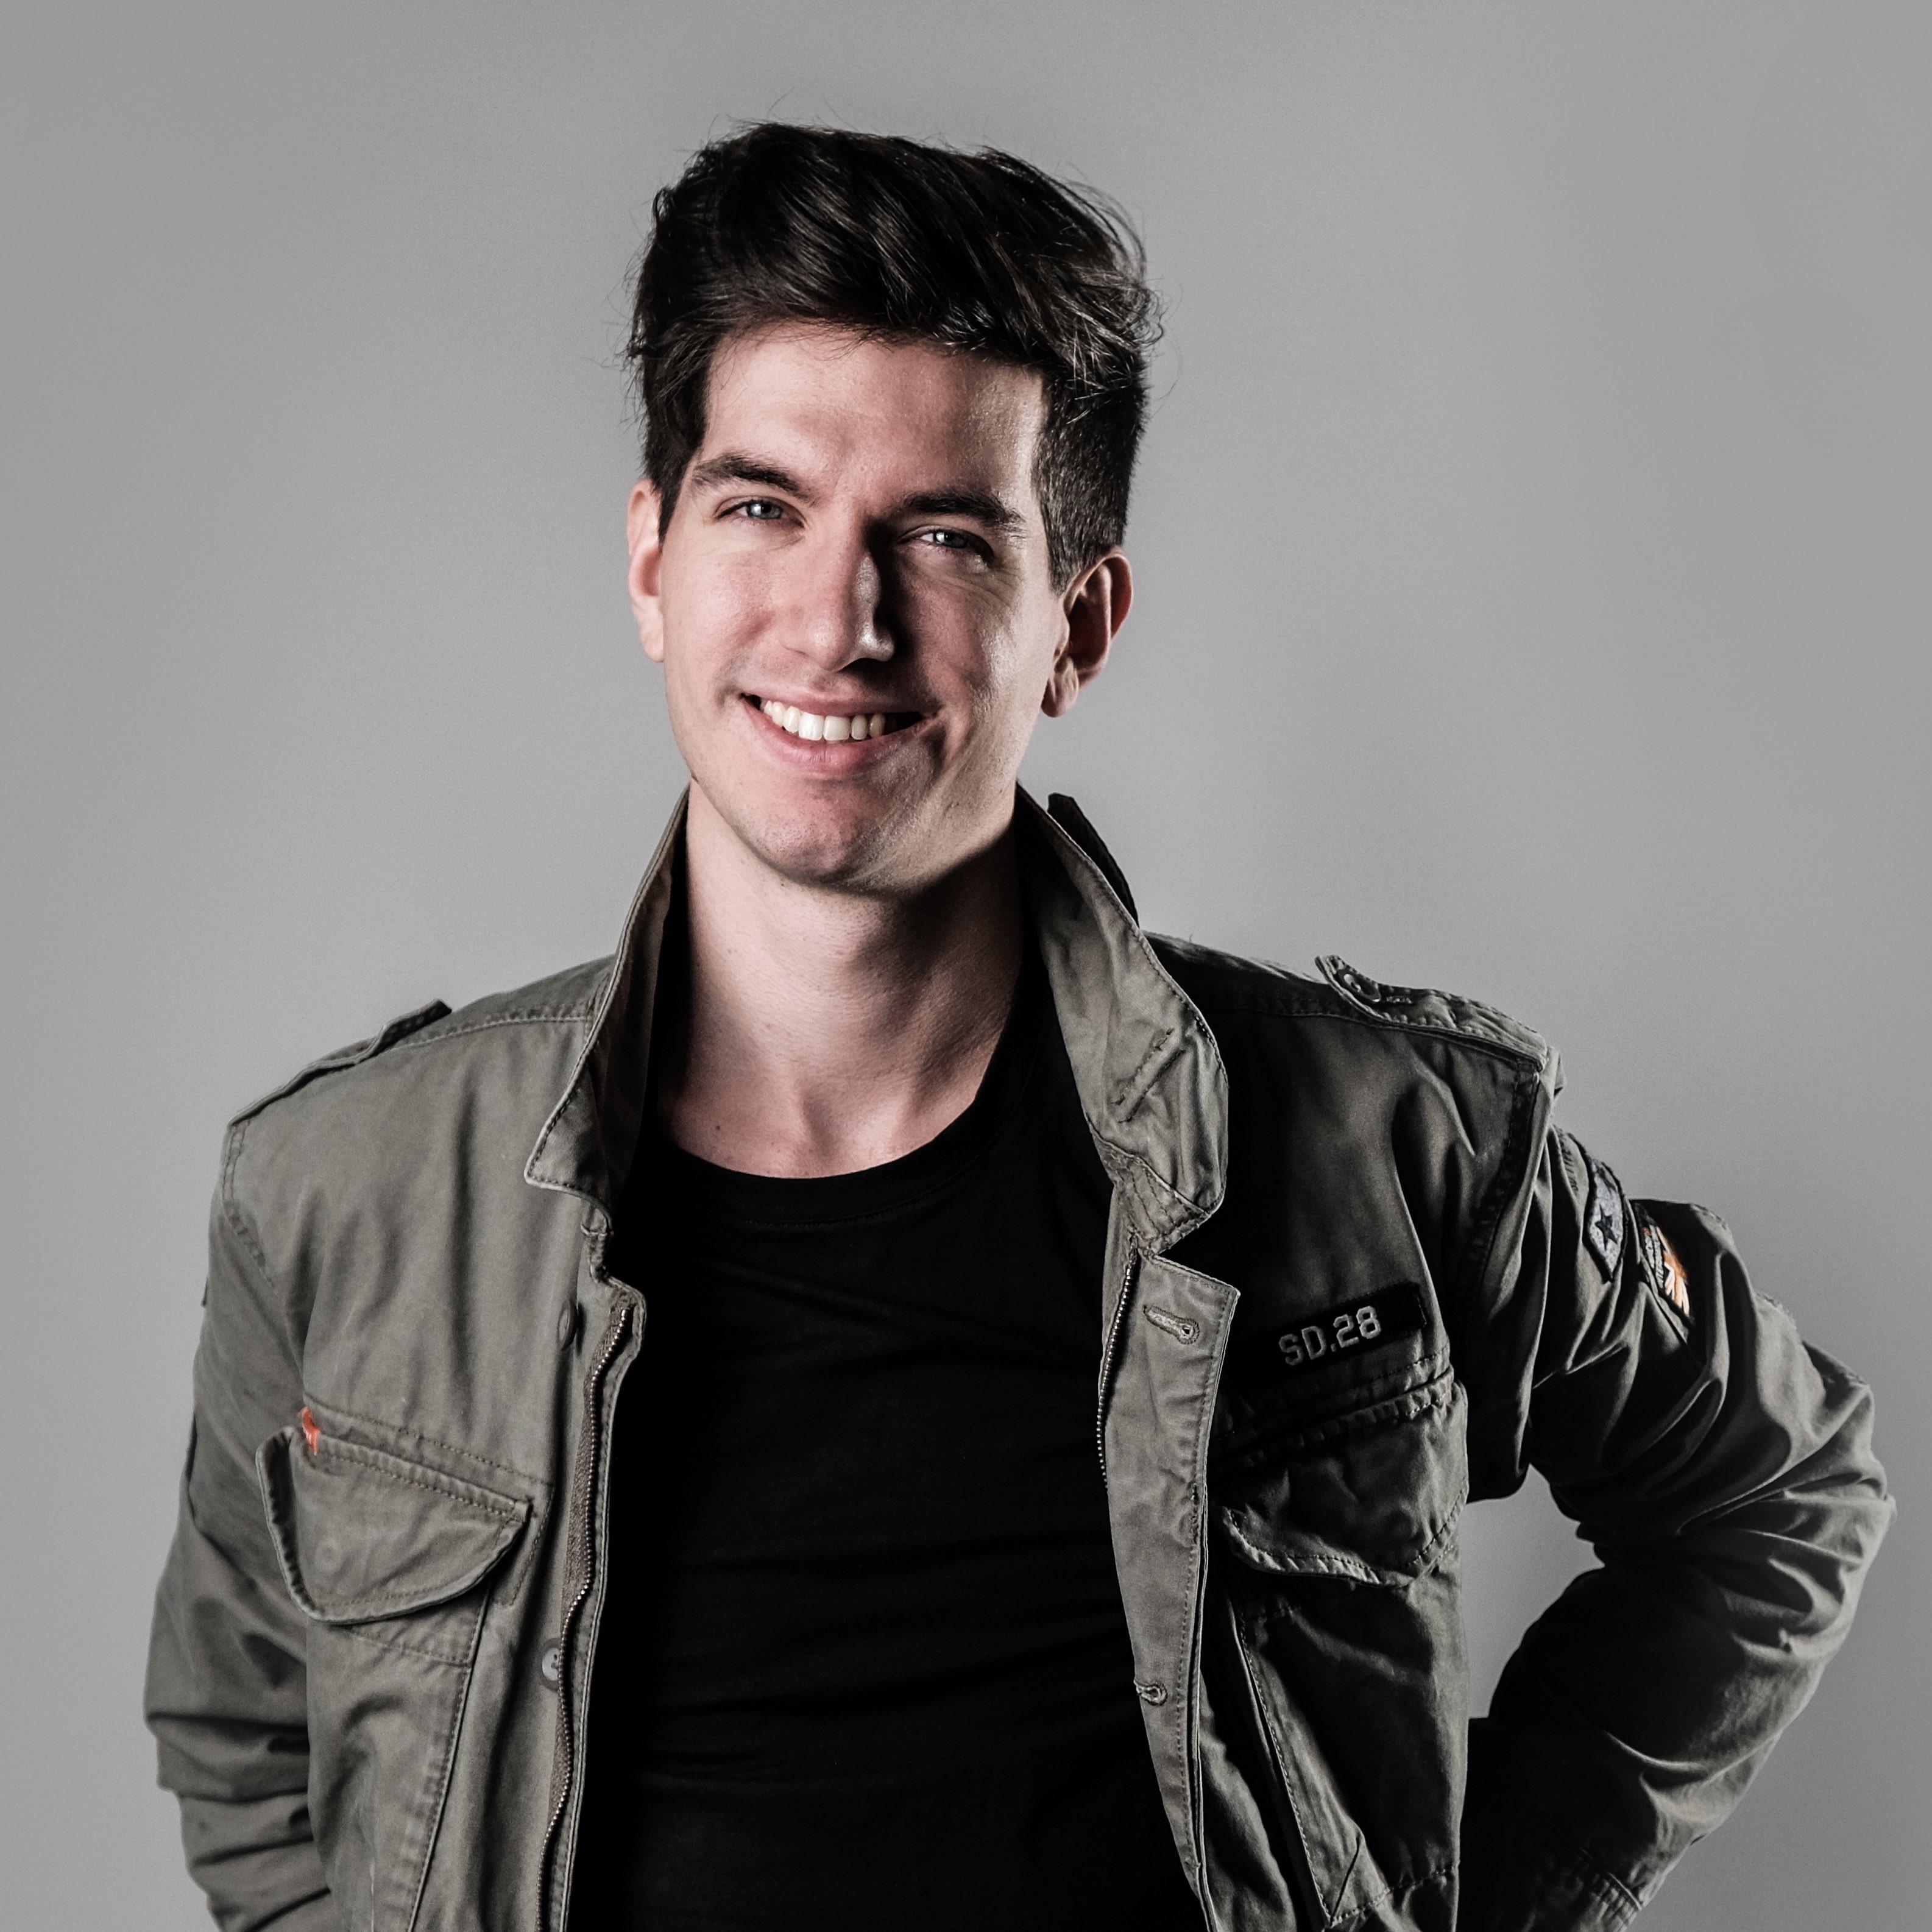 Matteo Giometto